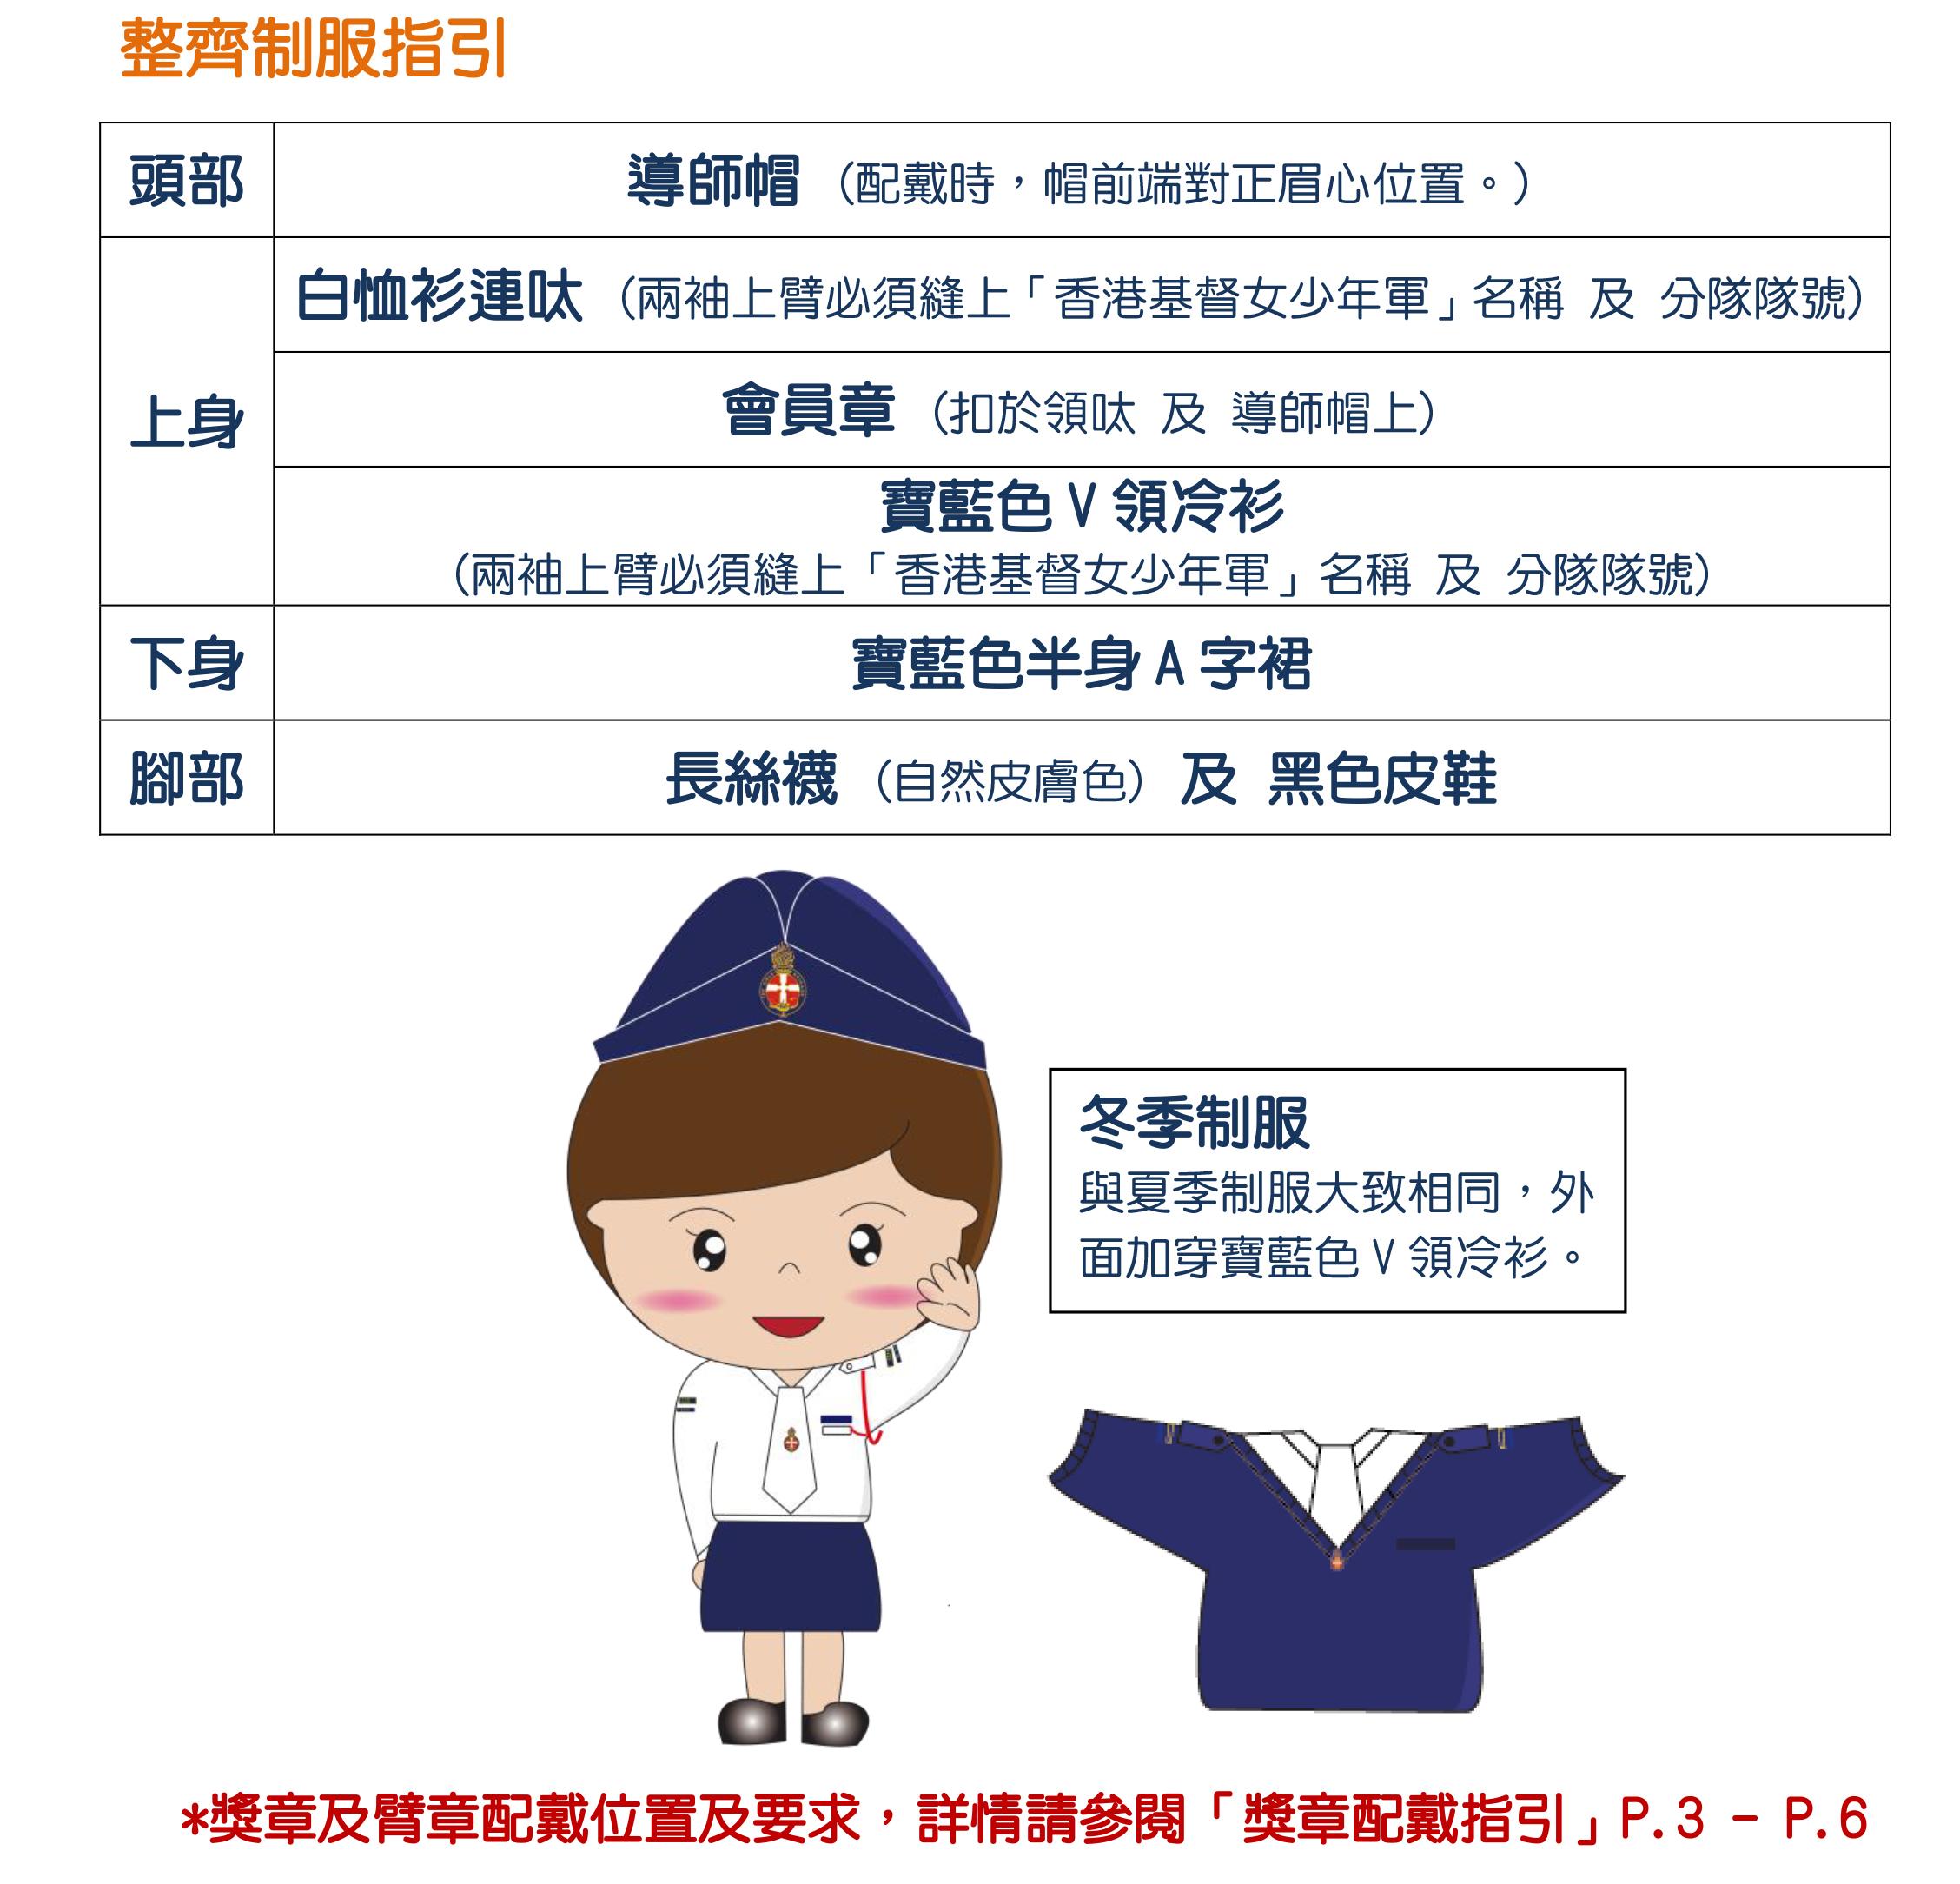 4- 導師制服穿著指引 (revised 20200828)